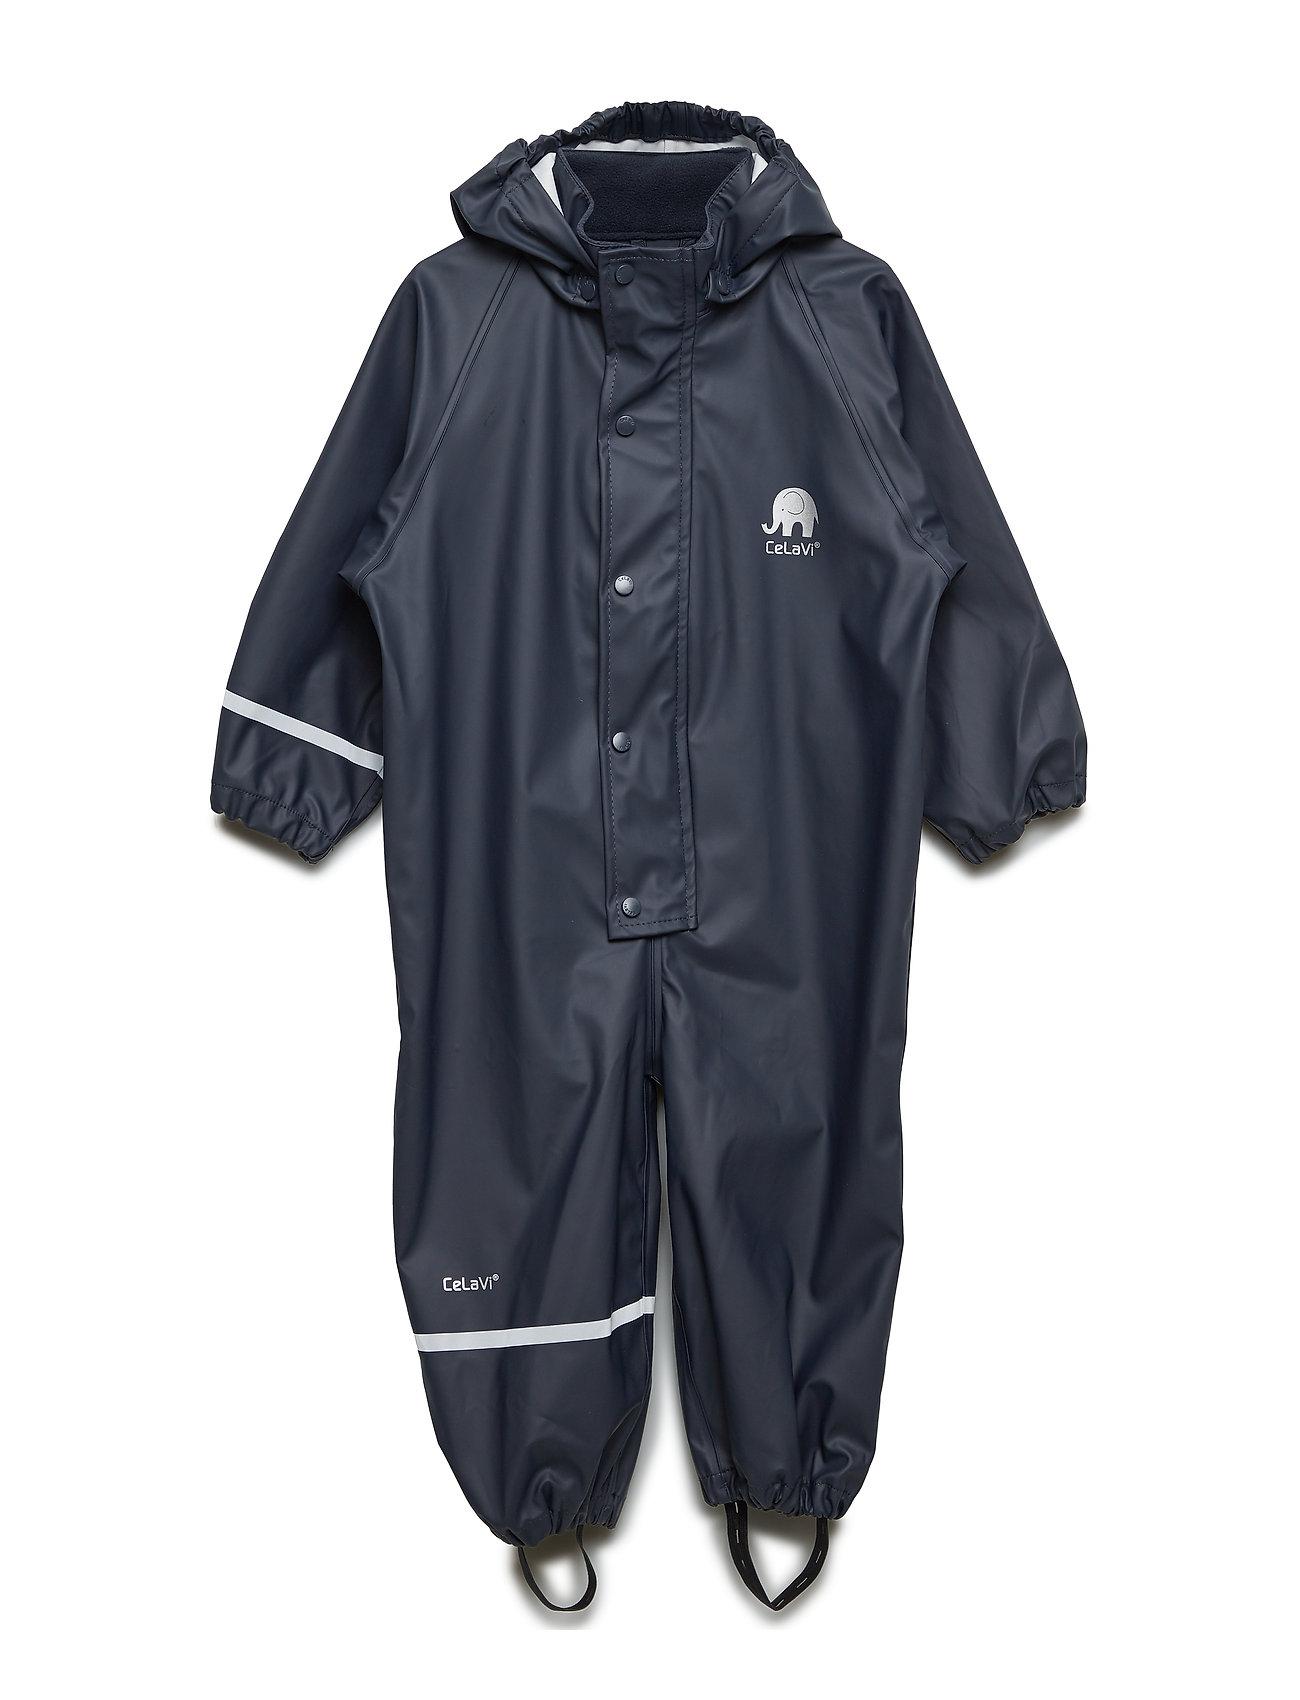 CeLaVi Rainwear suit -PU - DARK NAVY